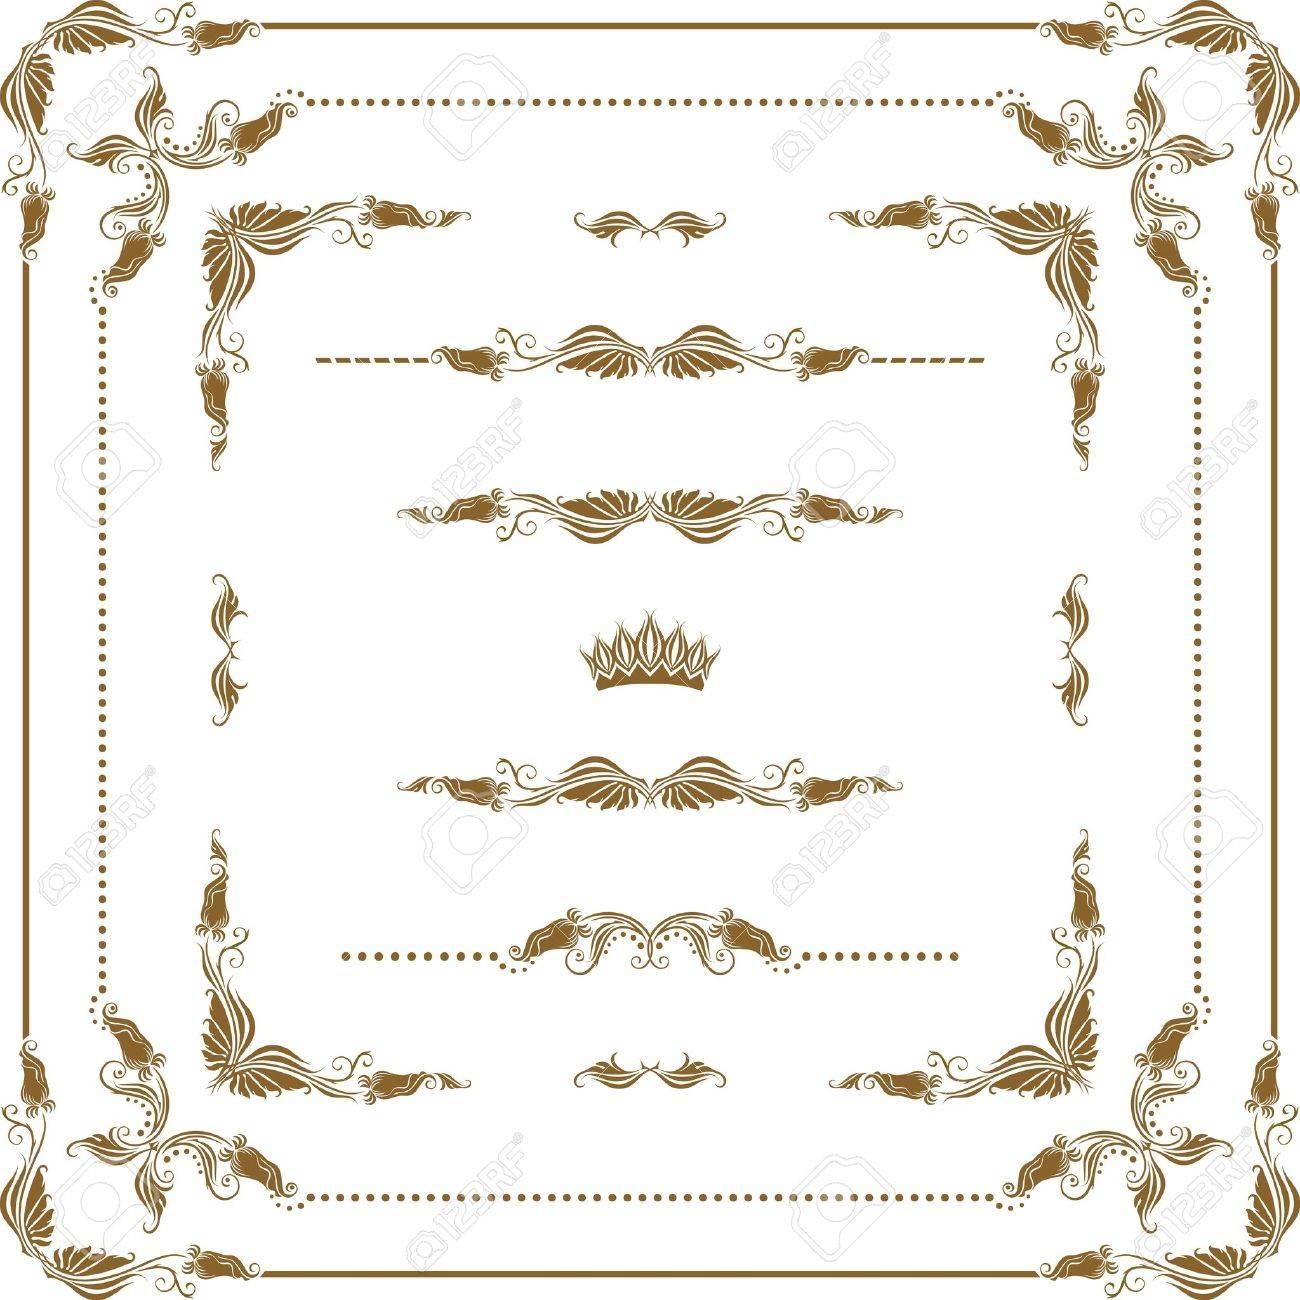 Vector set of decorative horizontal elements, border, frame Stock Vector - 12776627